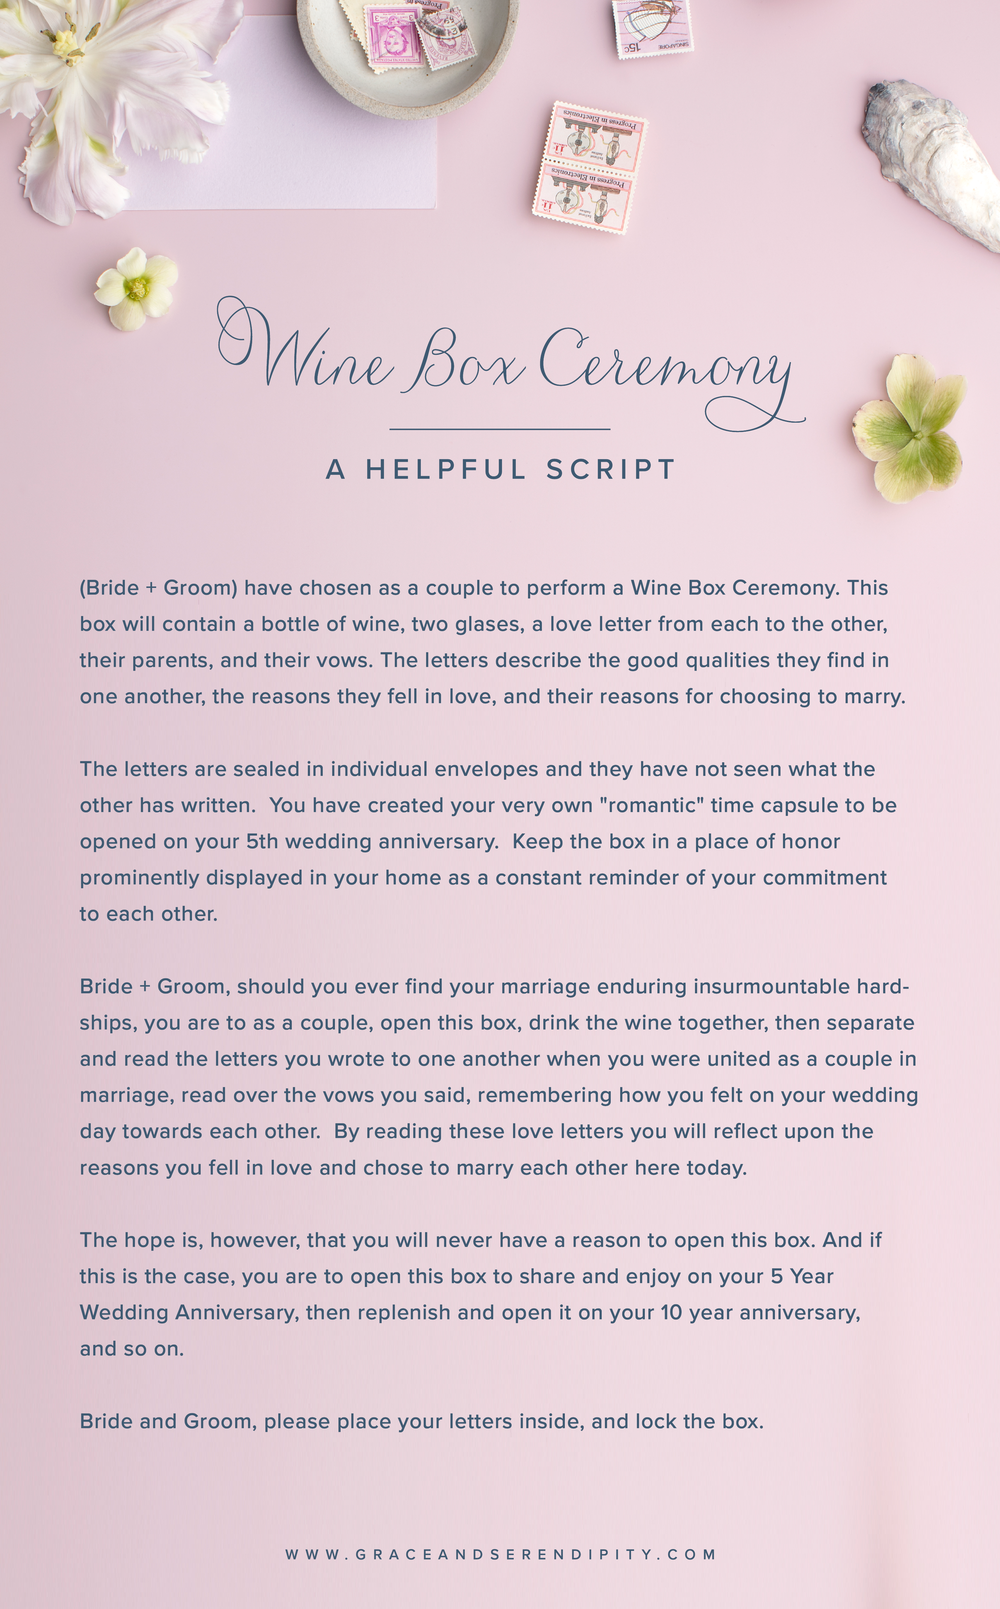 wine-box-ceremony-script